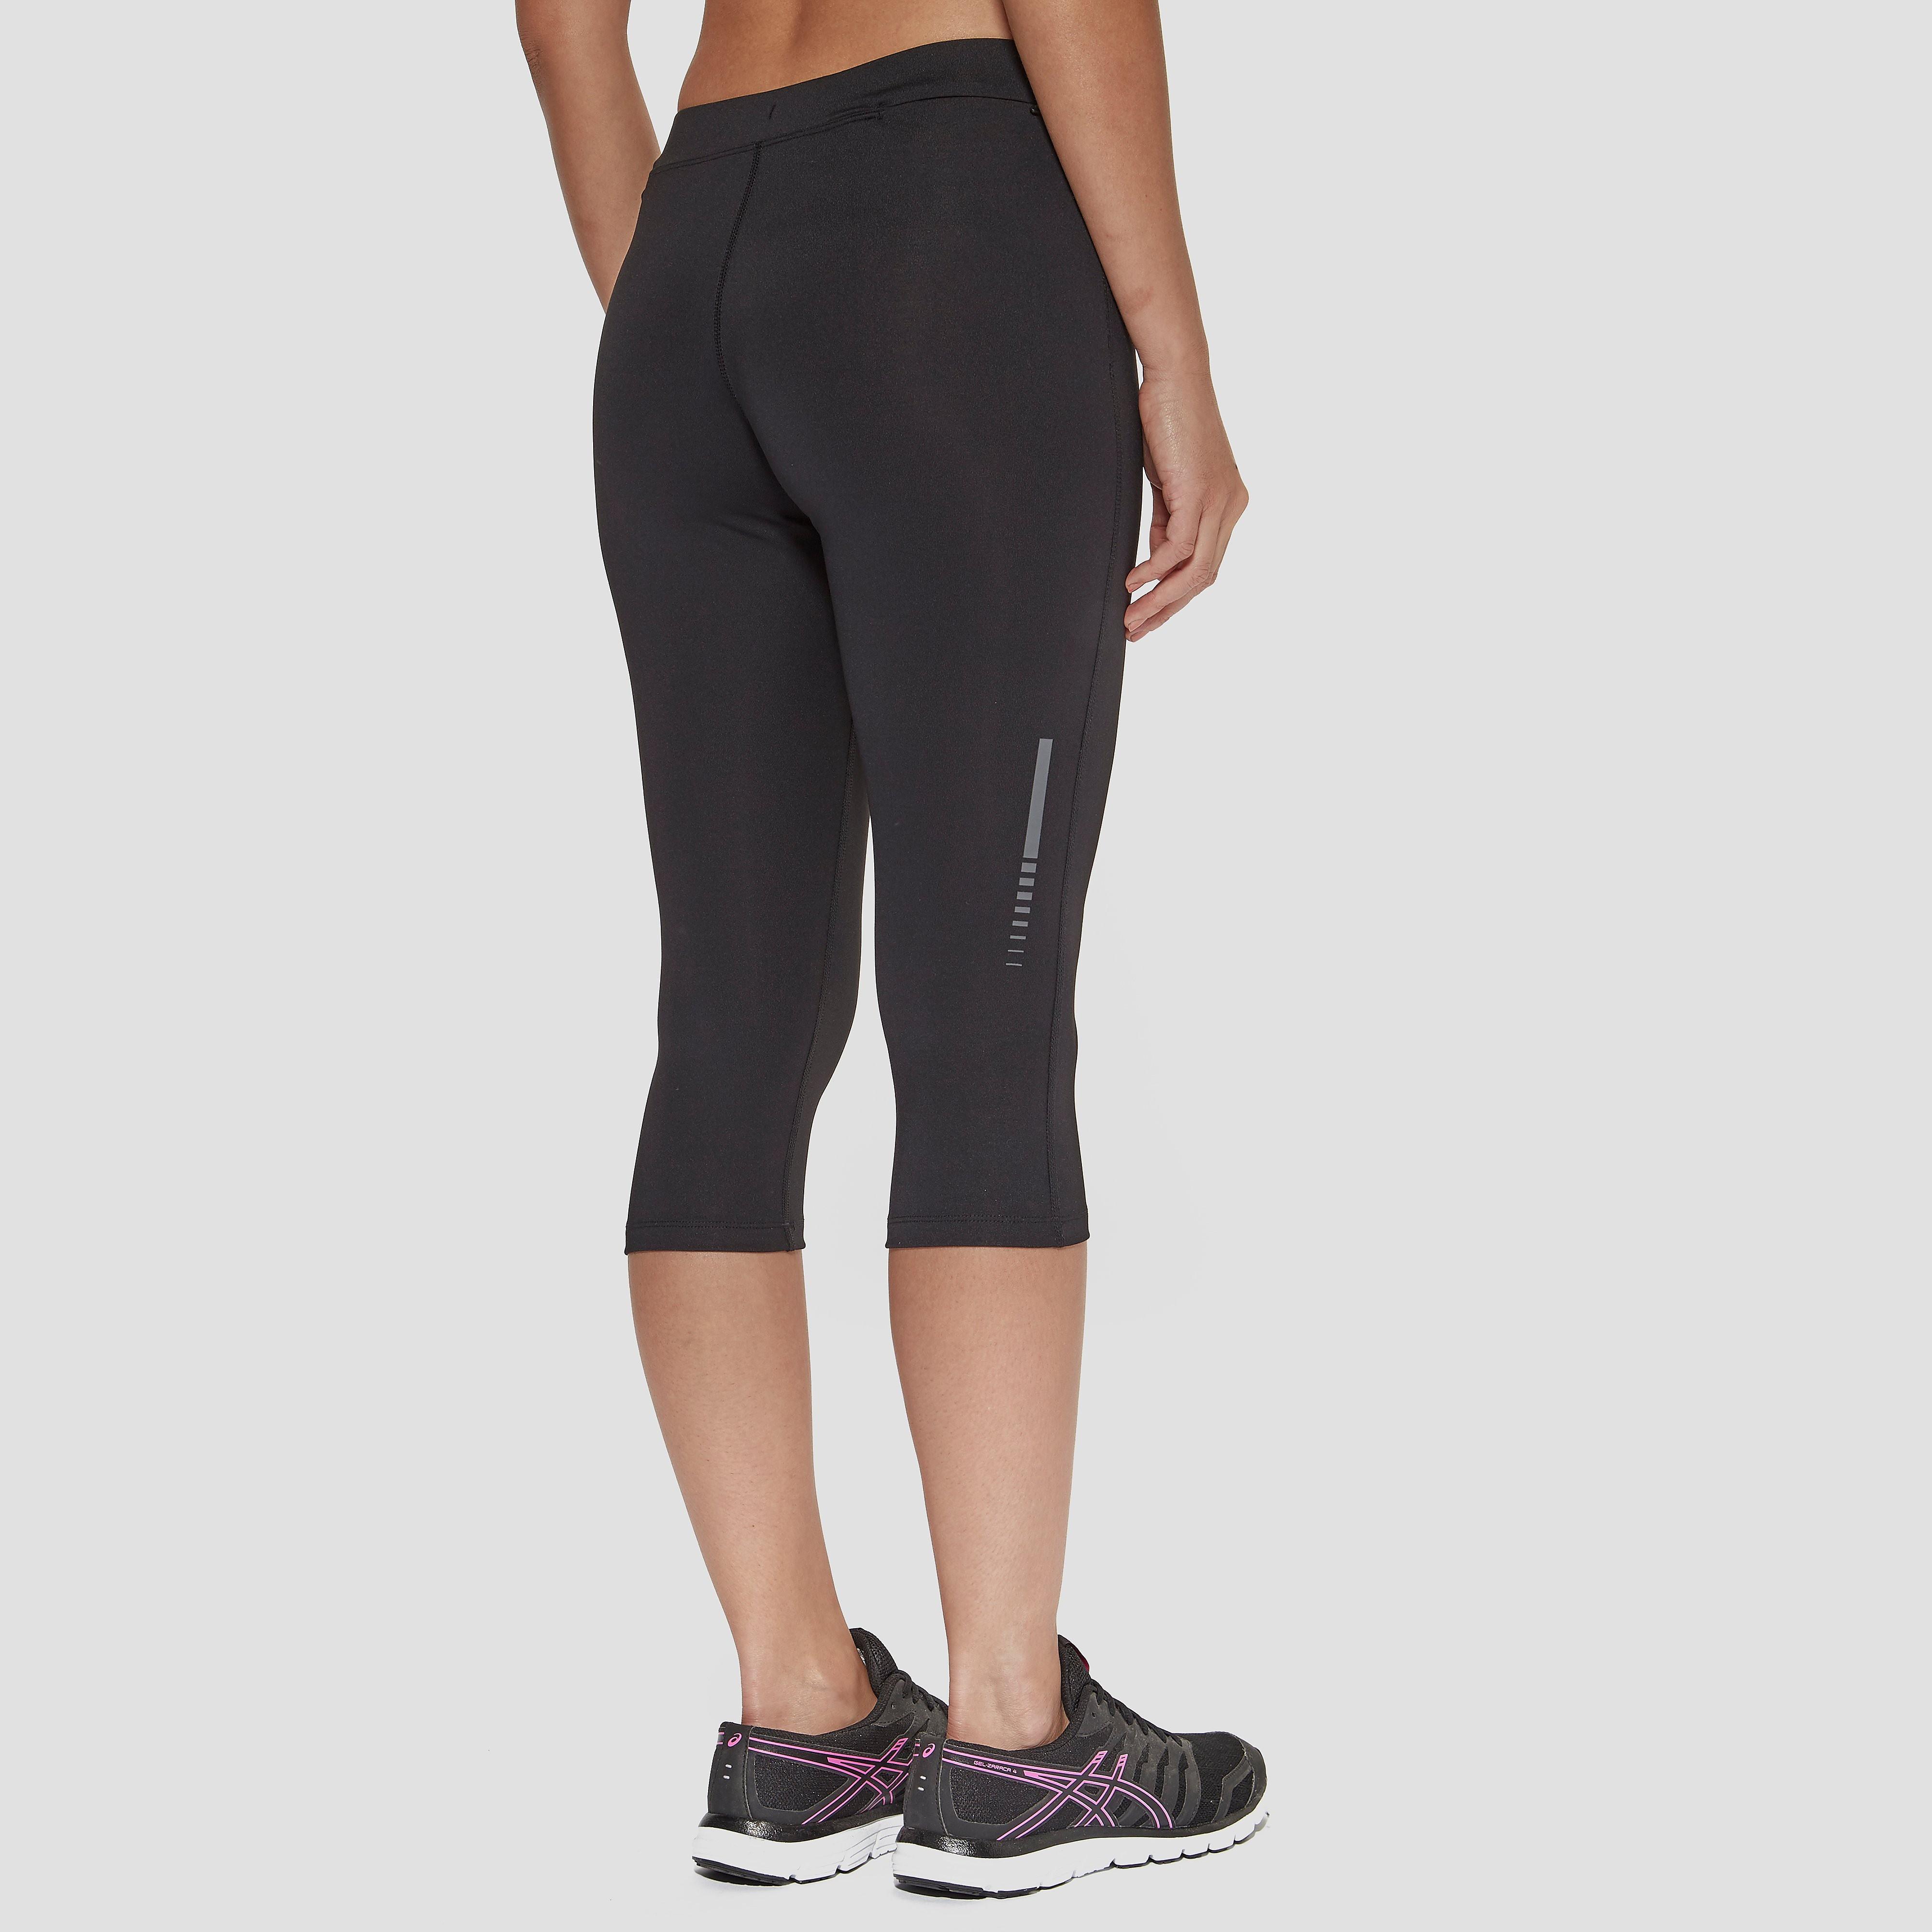 ASICS Women's 3/4 length Knee Tights